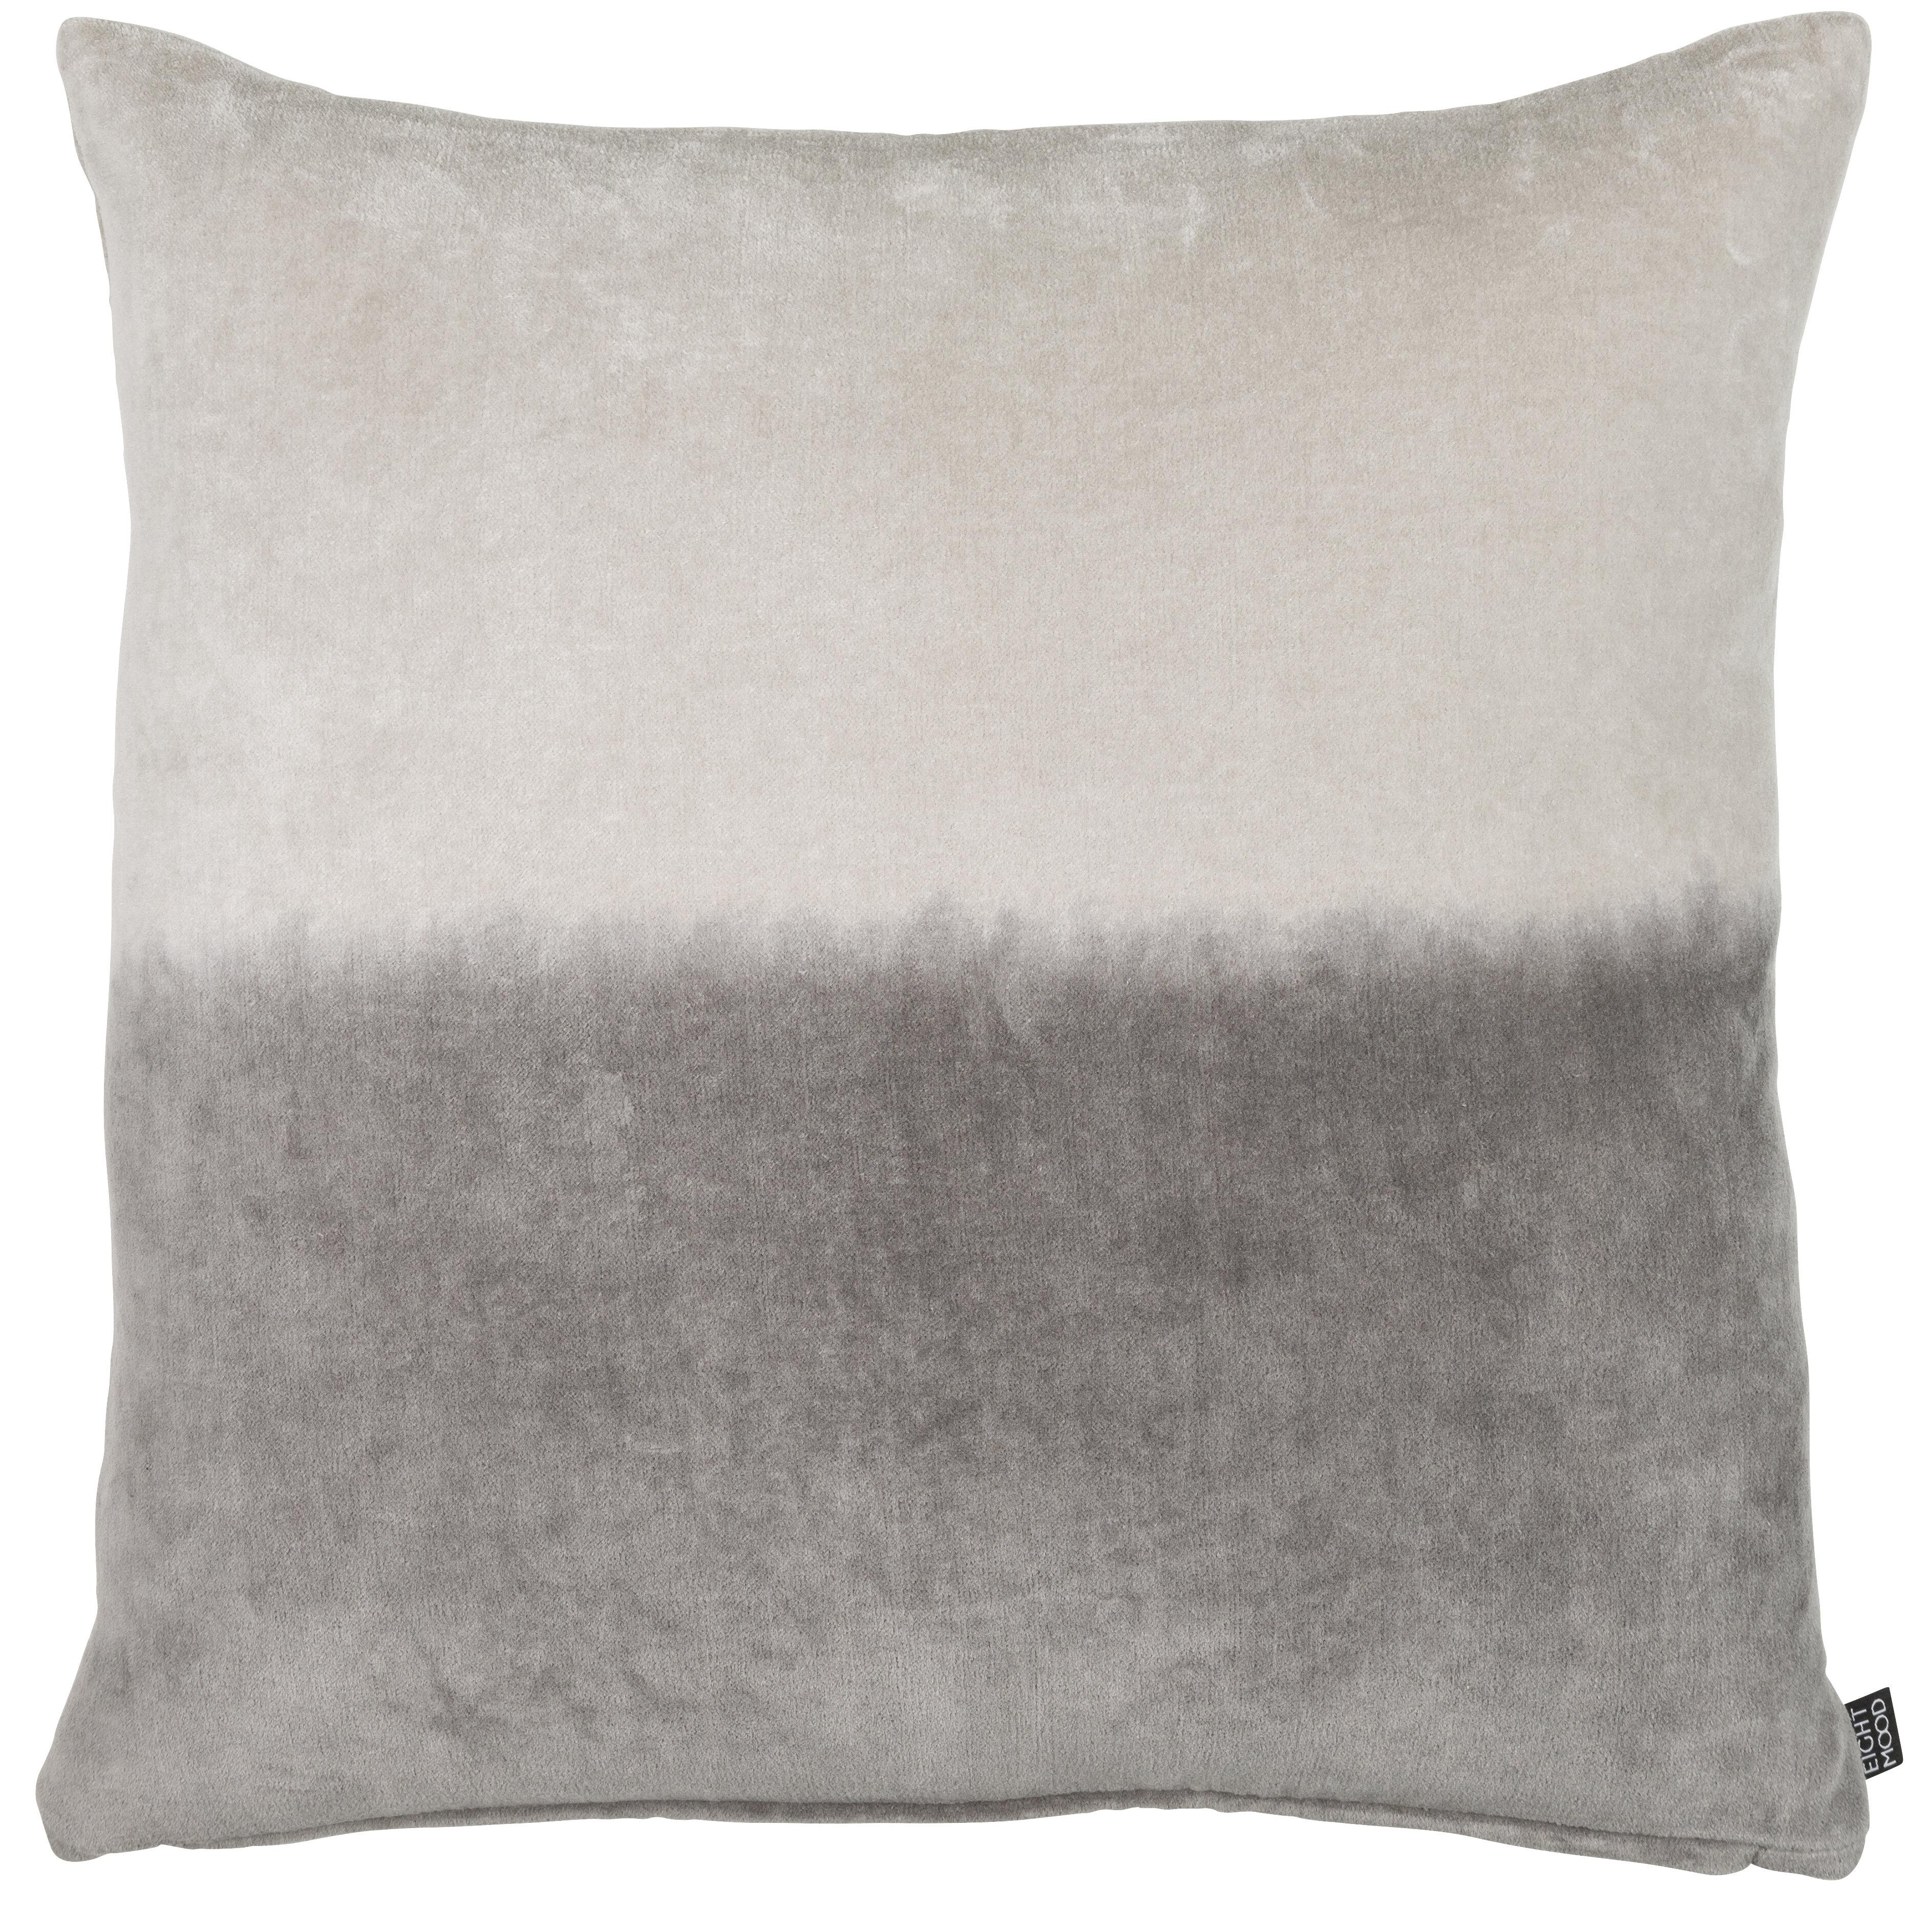 contessa best memory latex foam co all organic qapc queen pillow product anne bead selling